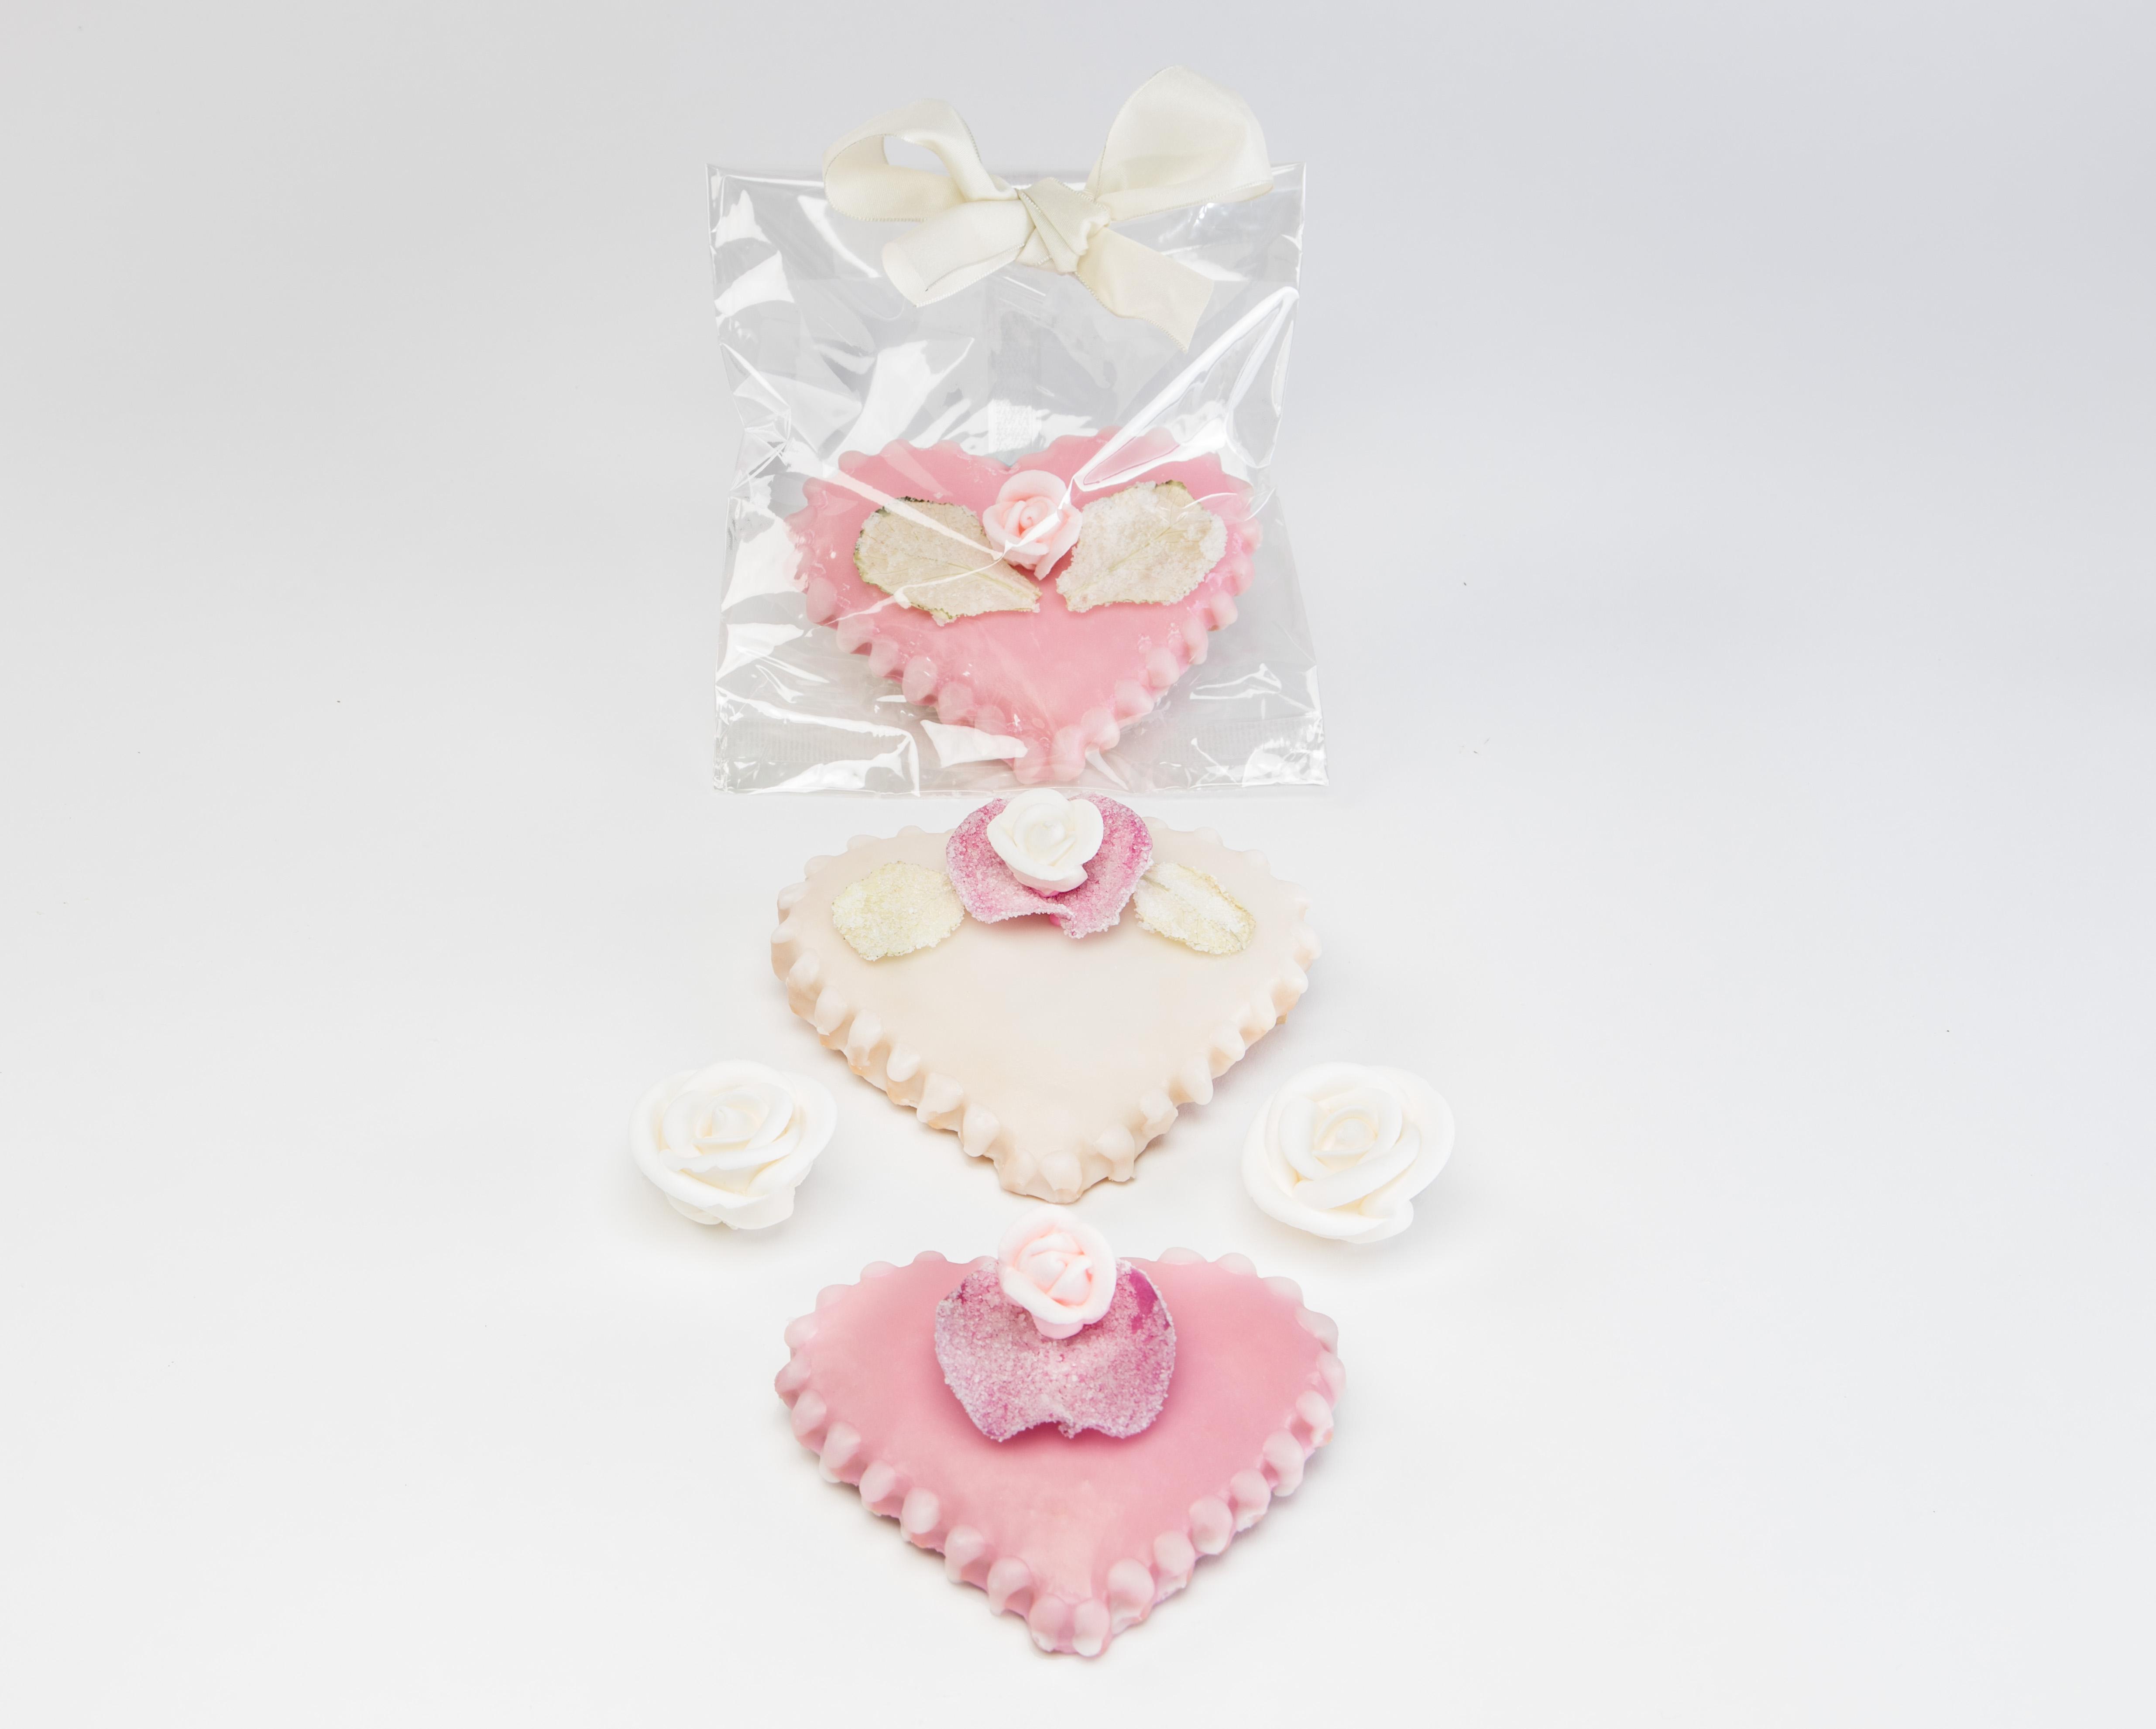 Elegant Heart Cookie Favors - Tastes Divine